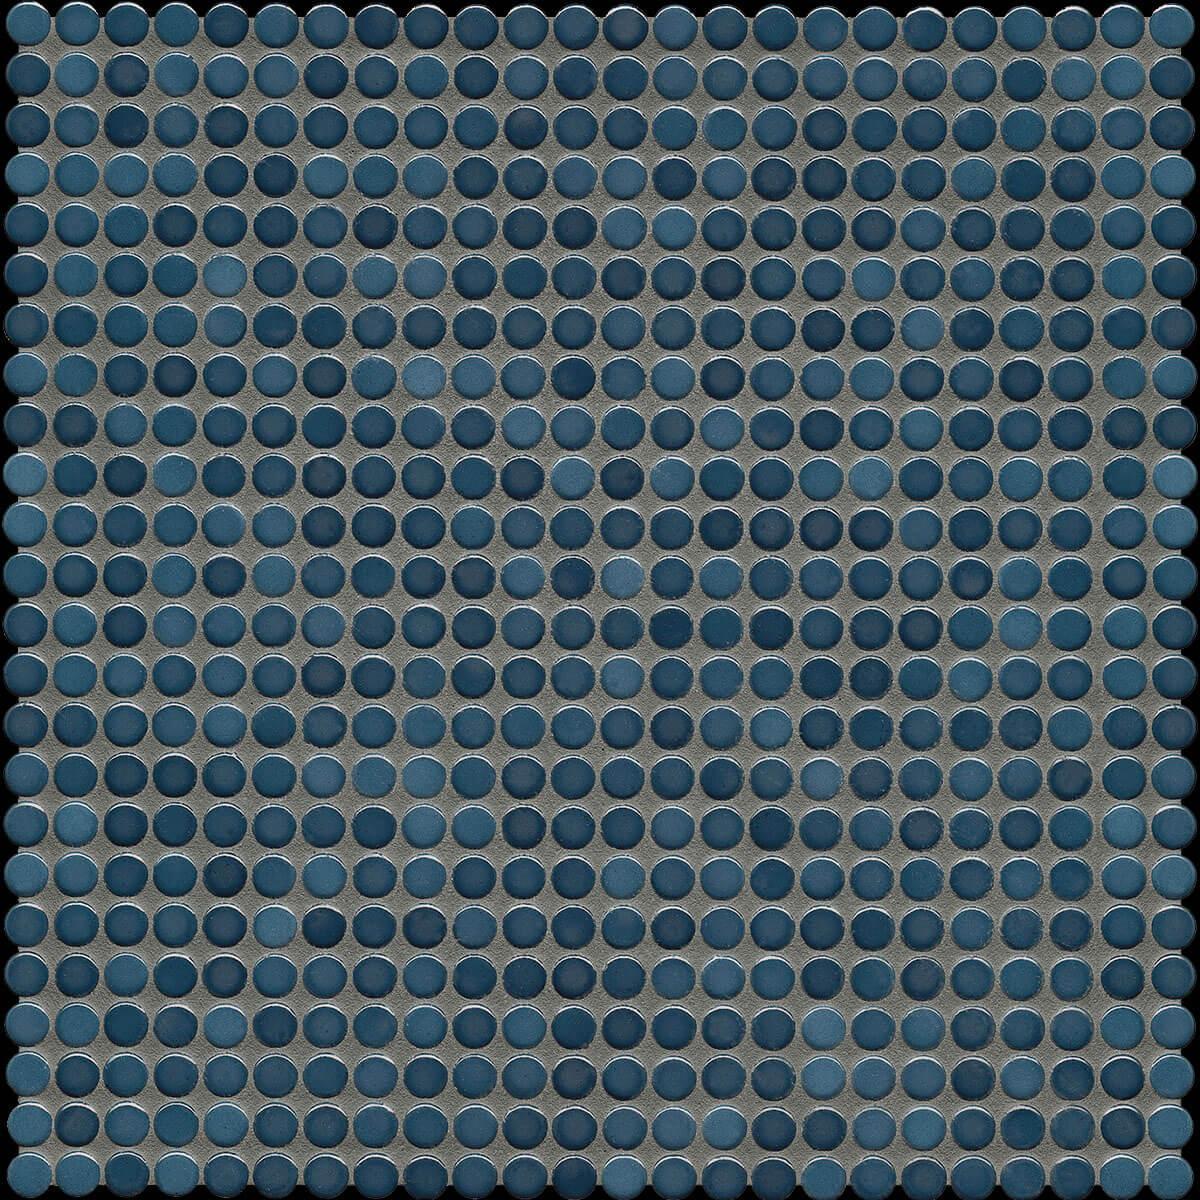 Agrob Buchtal Tiles - KLAY_Loop-_0005_40009H